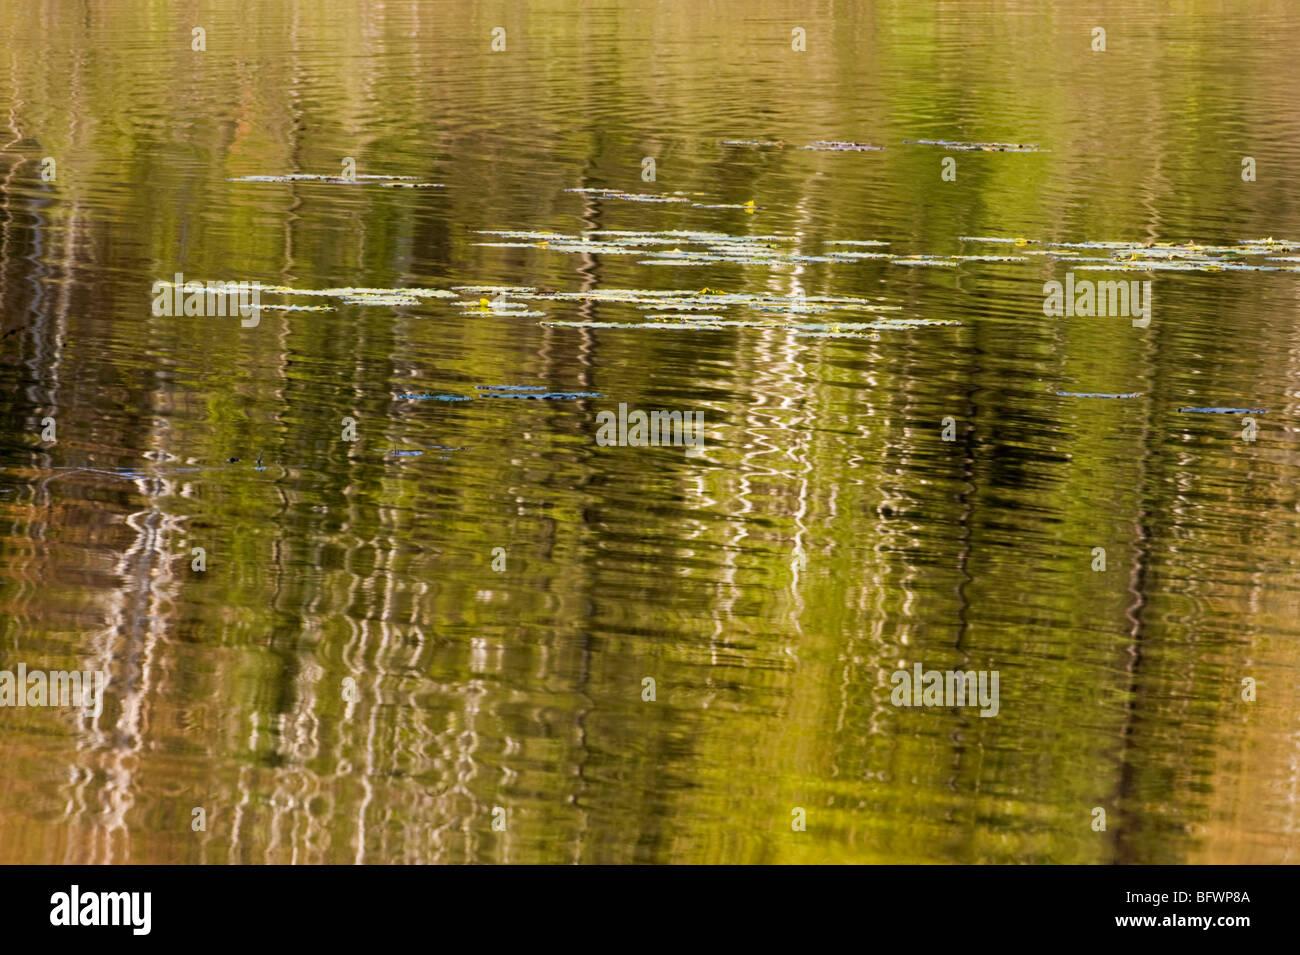 Birch tree reflections in beaverpond water, Greater Sudbury, Ontario, Canada Stock Photo